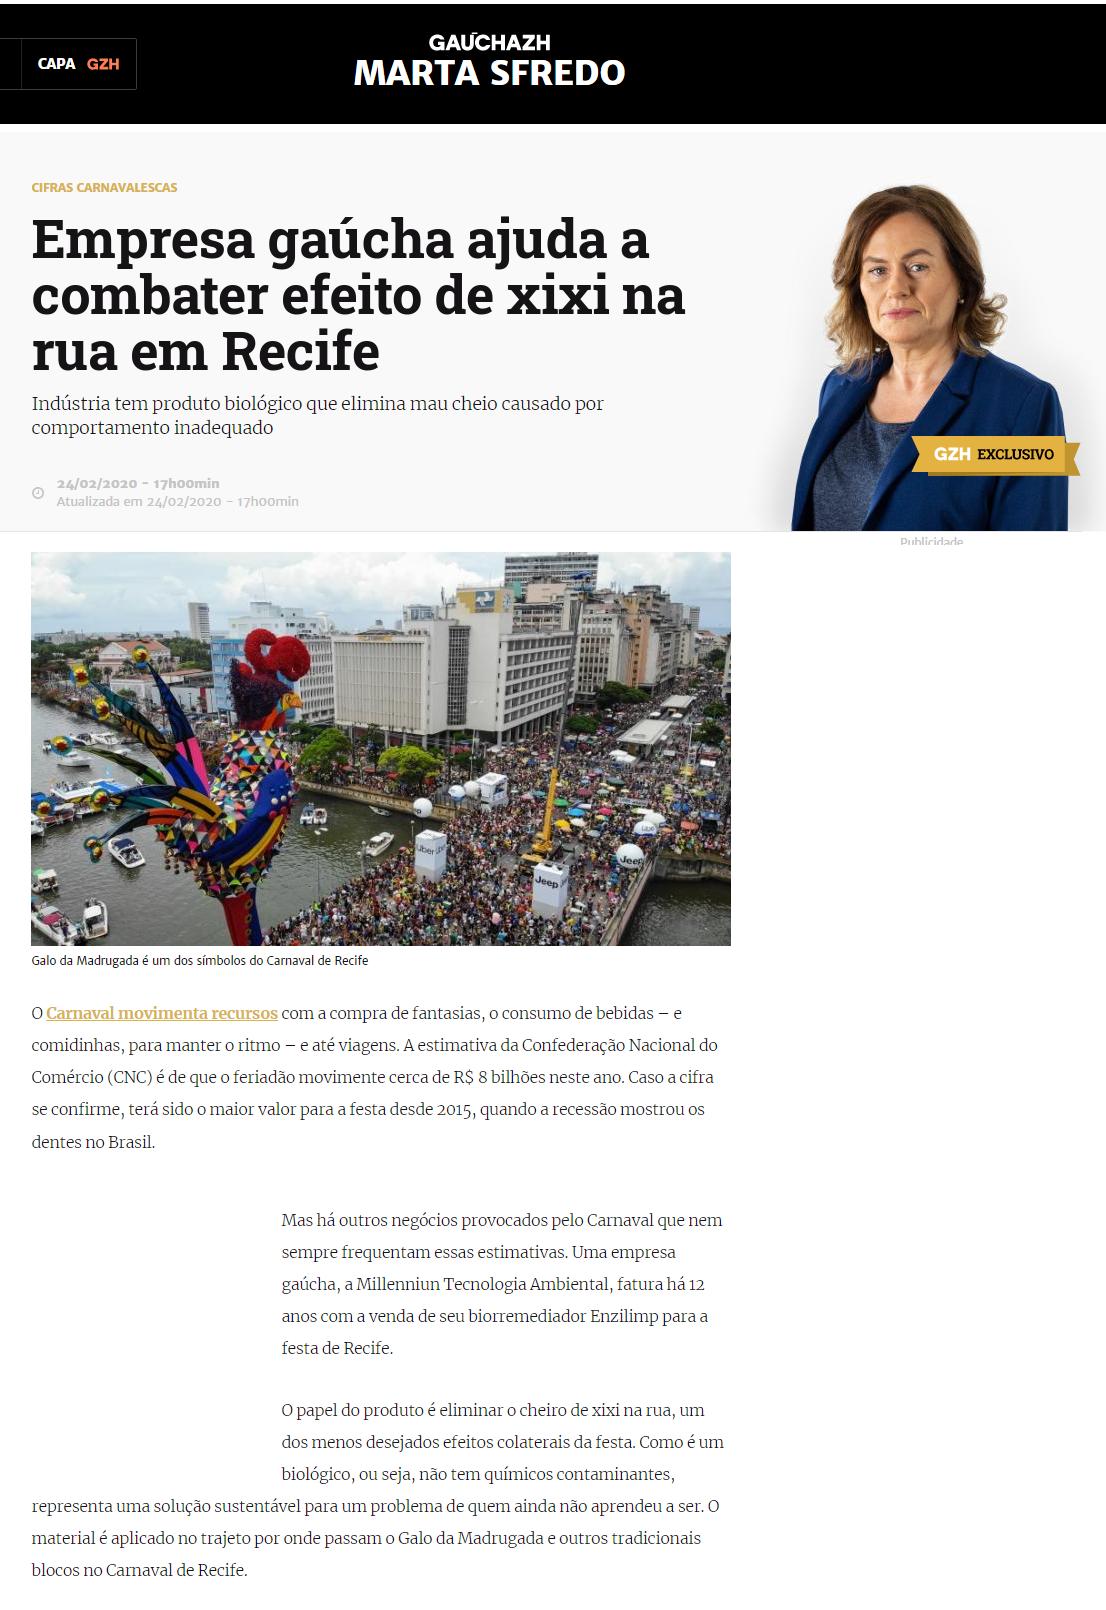 Empresa gaúcha ajuda a combater efeito de xixi na rua em Recife, Enzilimp